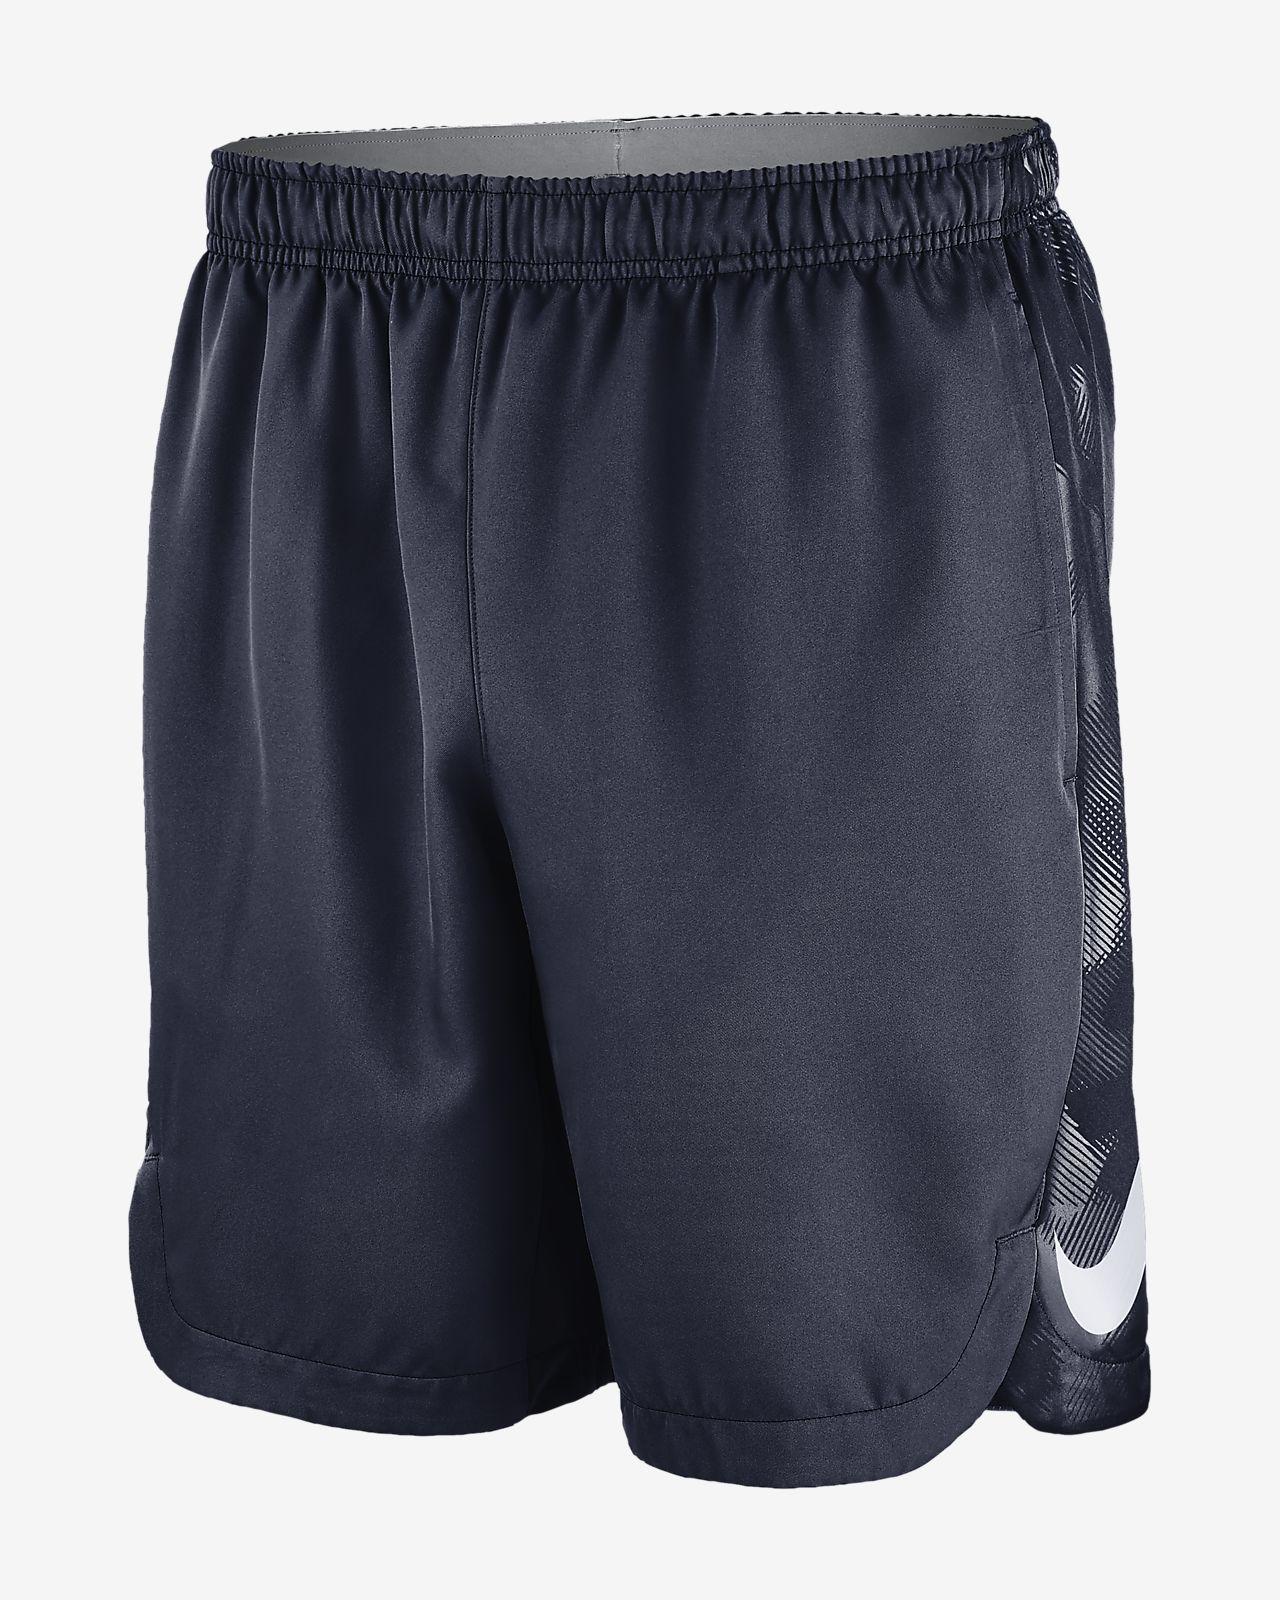 Nike Dri-FIT (MLB Brewers) Men's Shorts